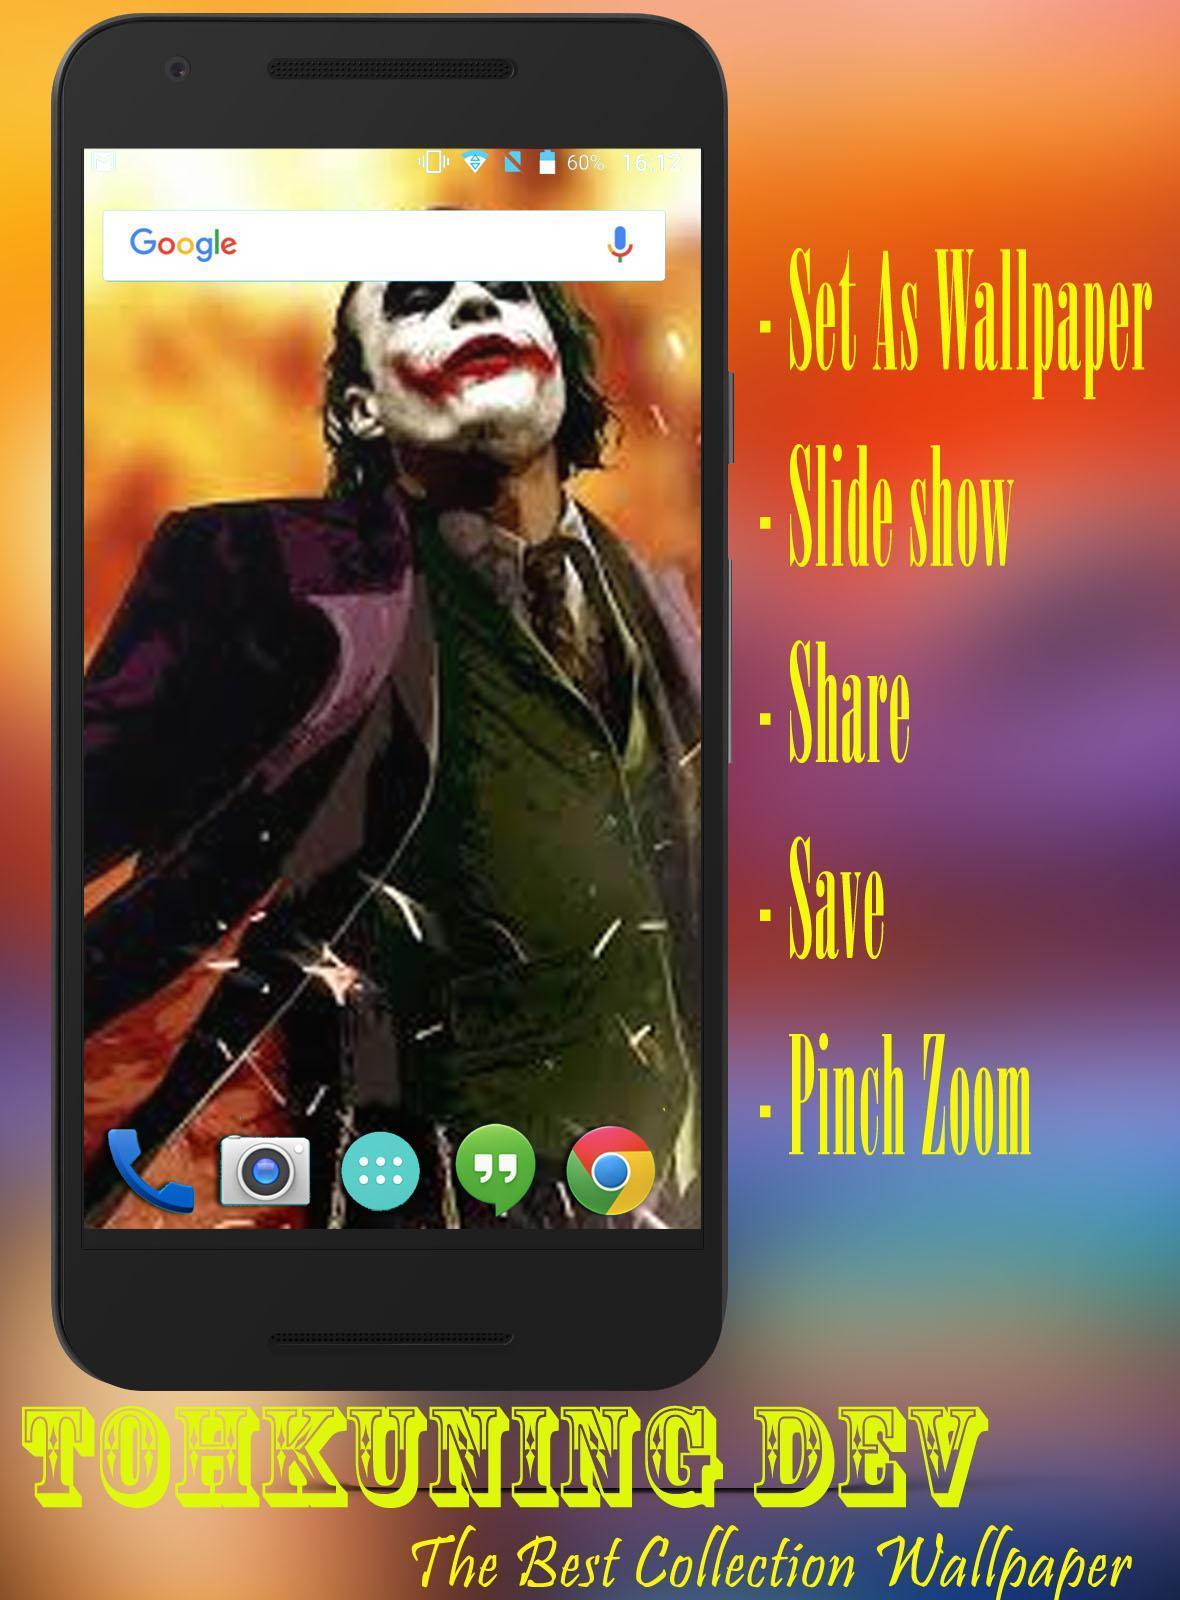 Joker Wallpaper Hd/4k for Android - APK Download